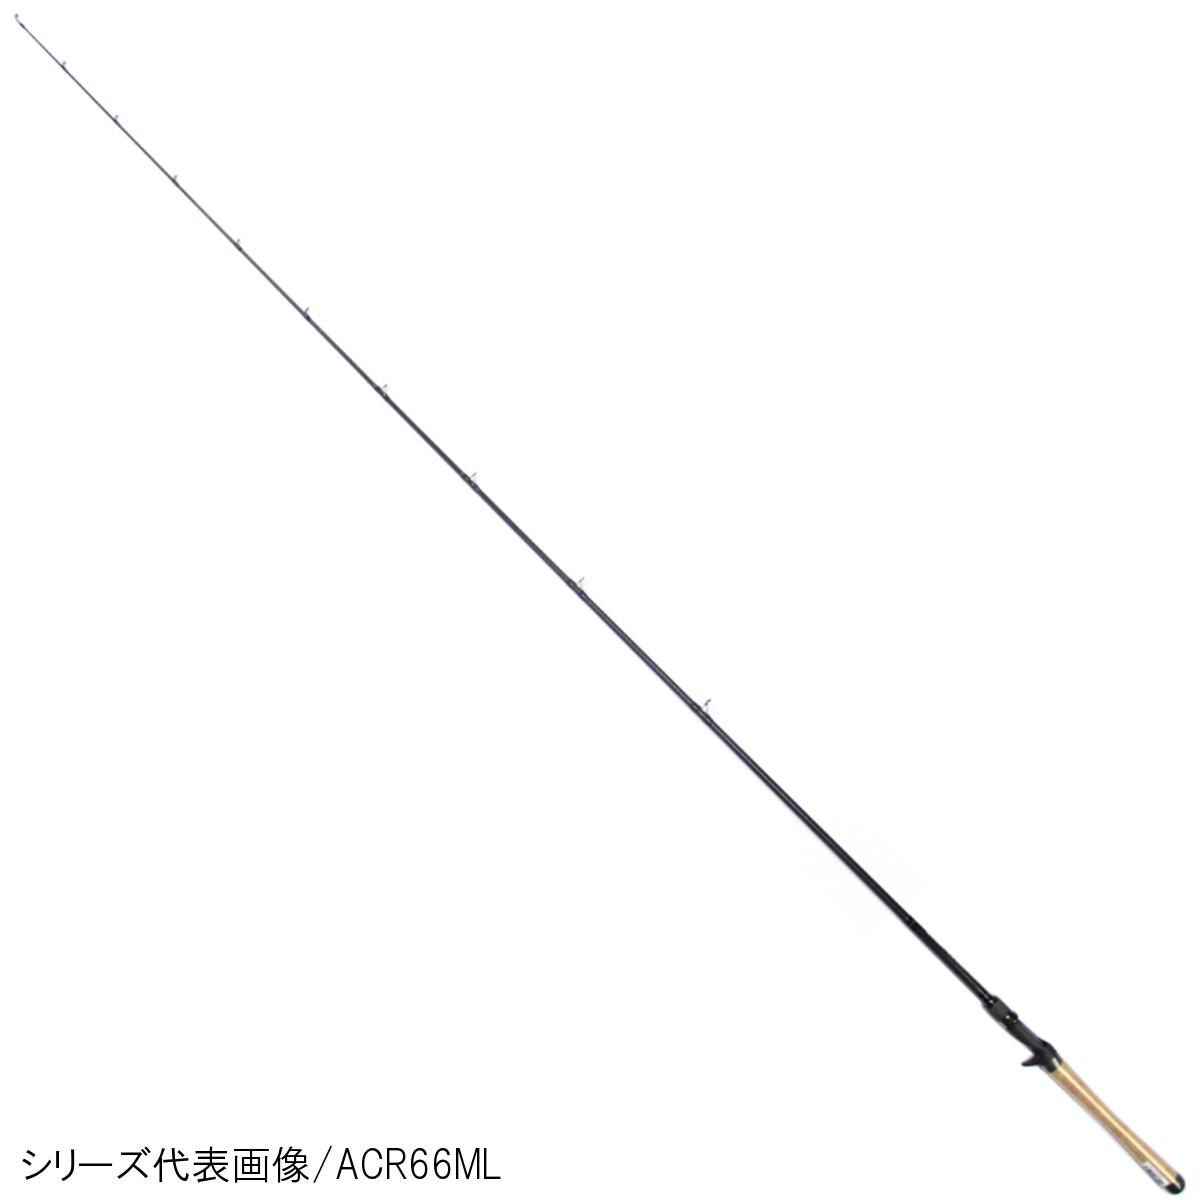 J Custom 2.0 アドバンスト・クランキング・ロッド ACR69M【大型商品】(東日本店)